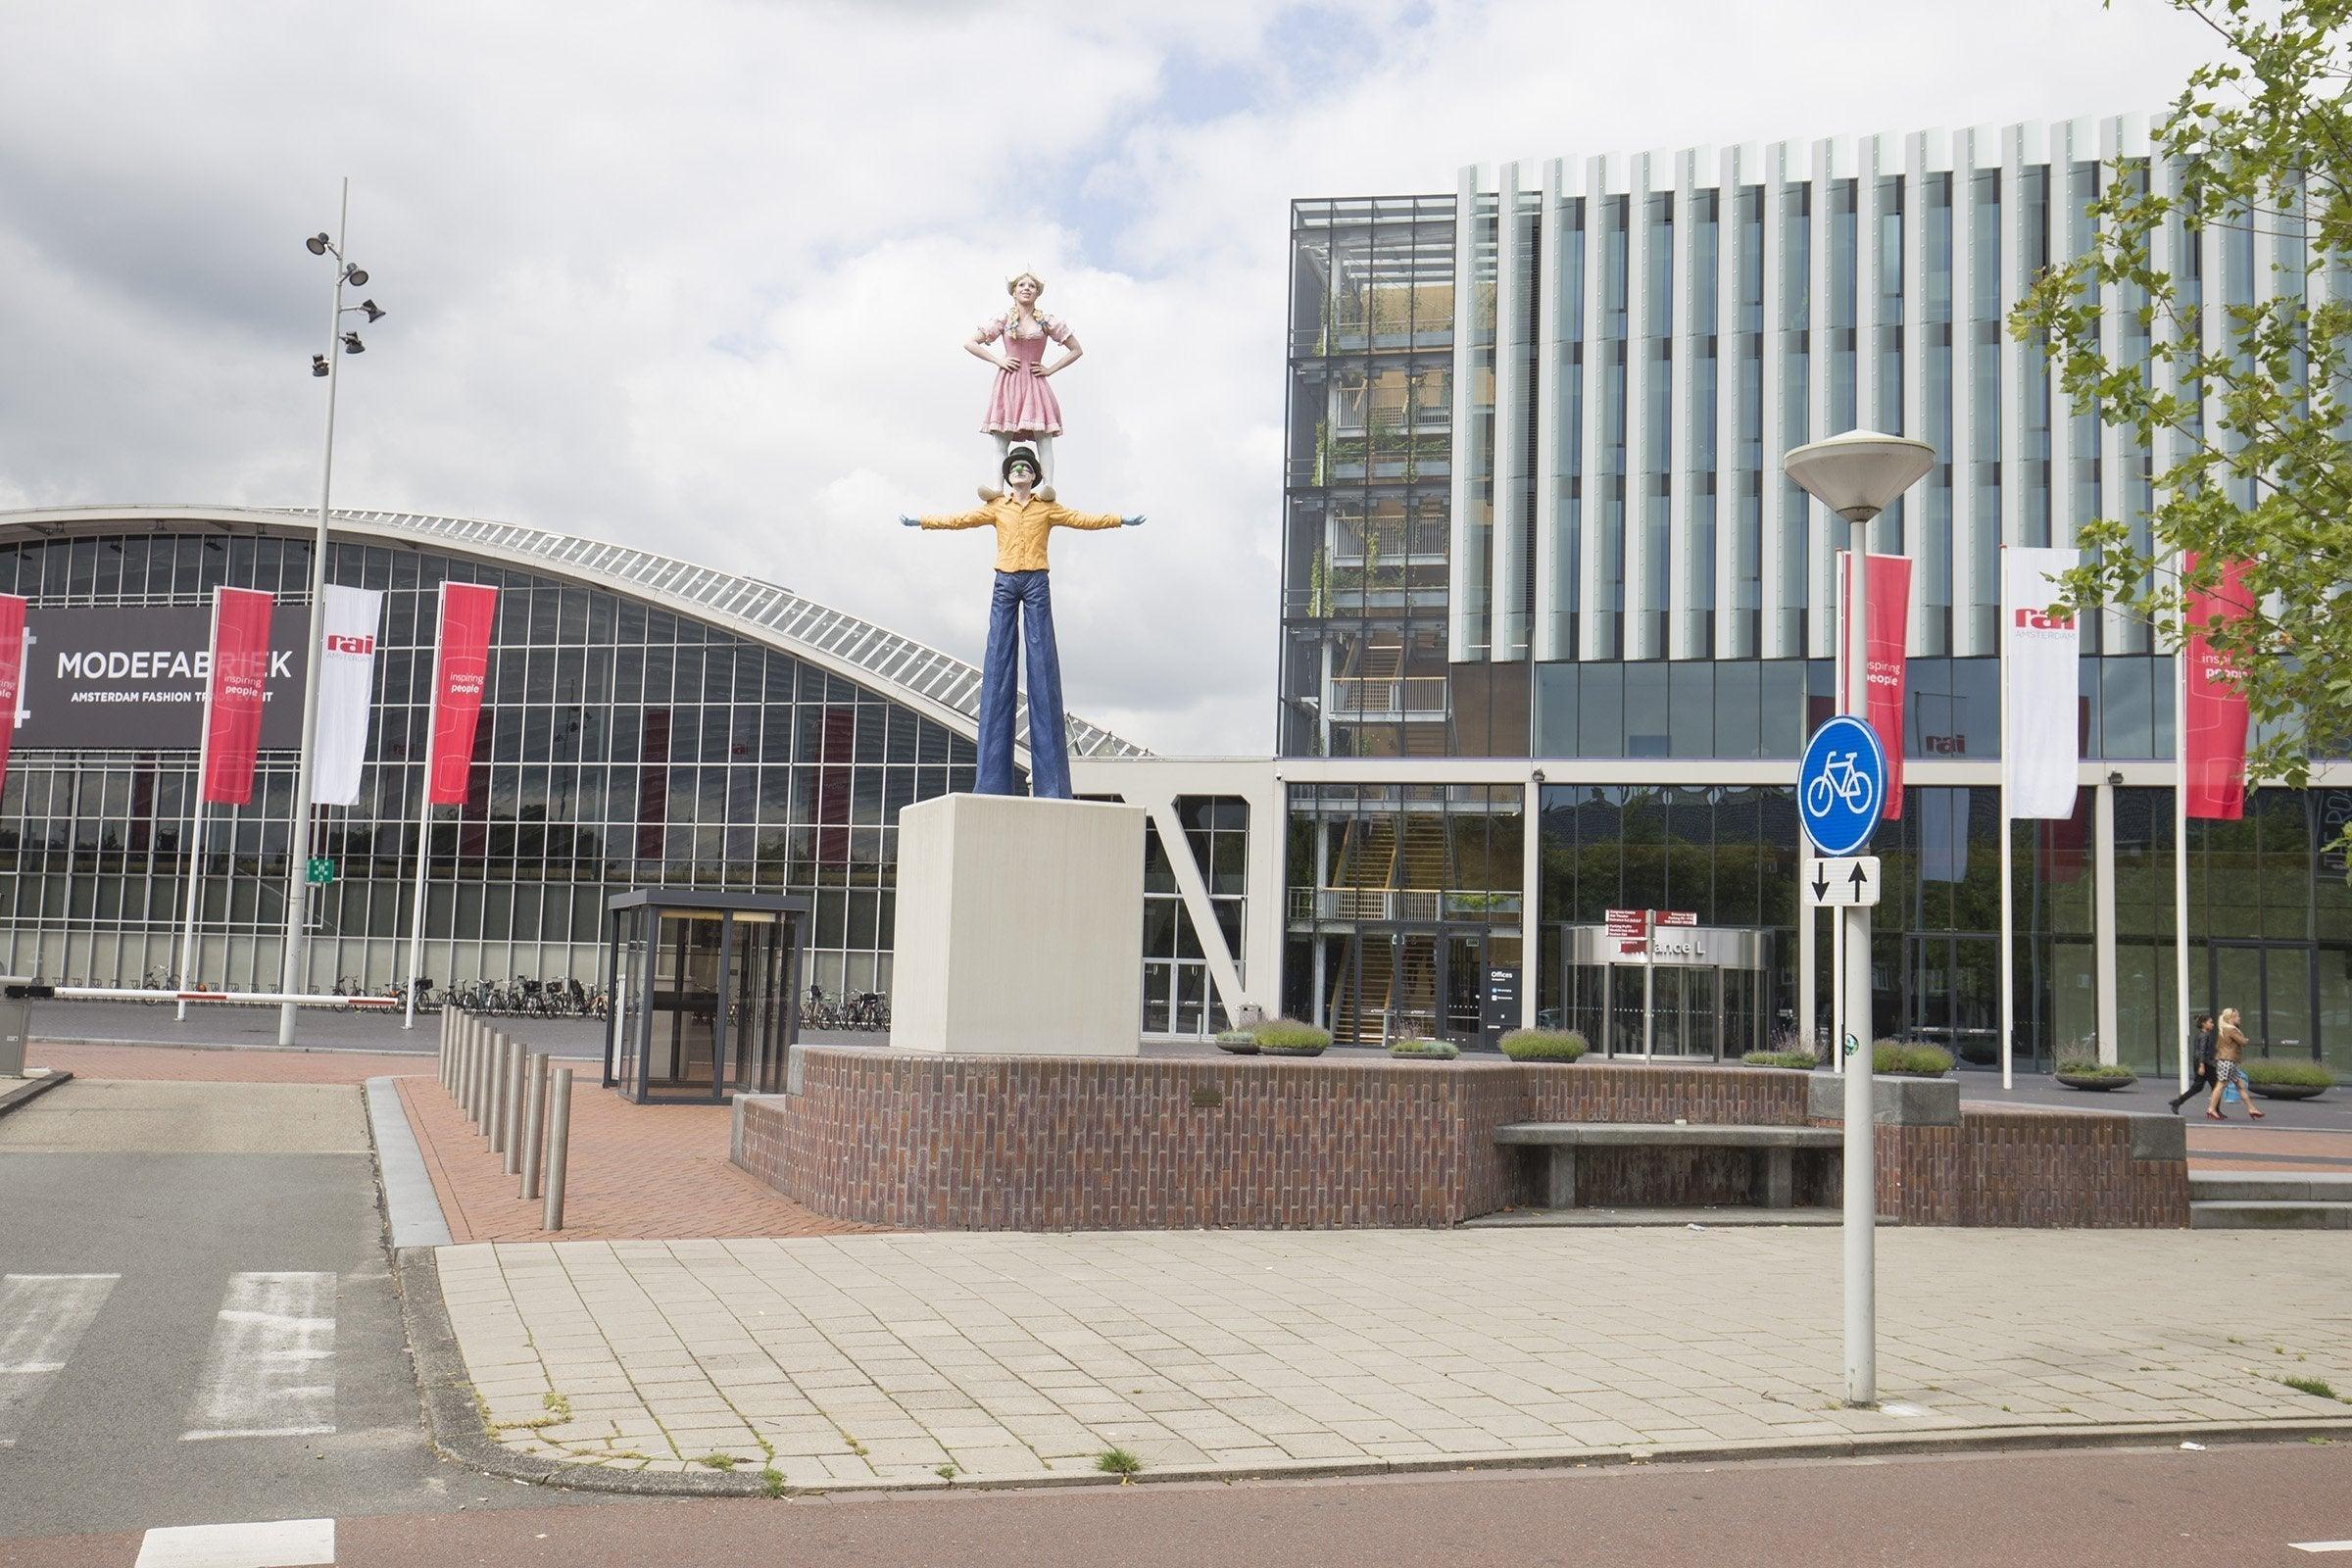 https://public.parariusoffice.nl/15/photos/huge/51297712.1504079814-554.jpg